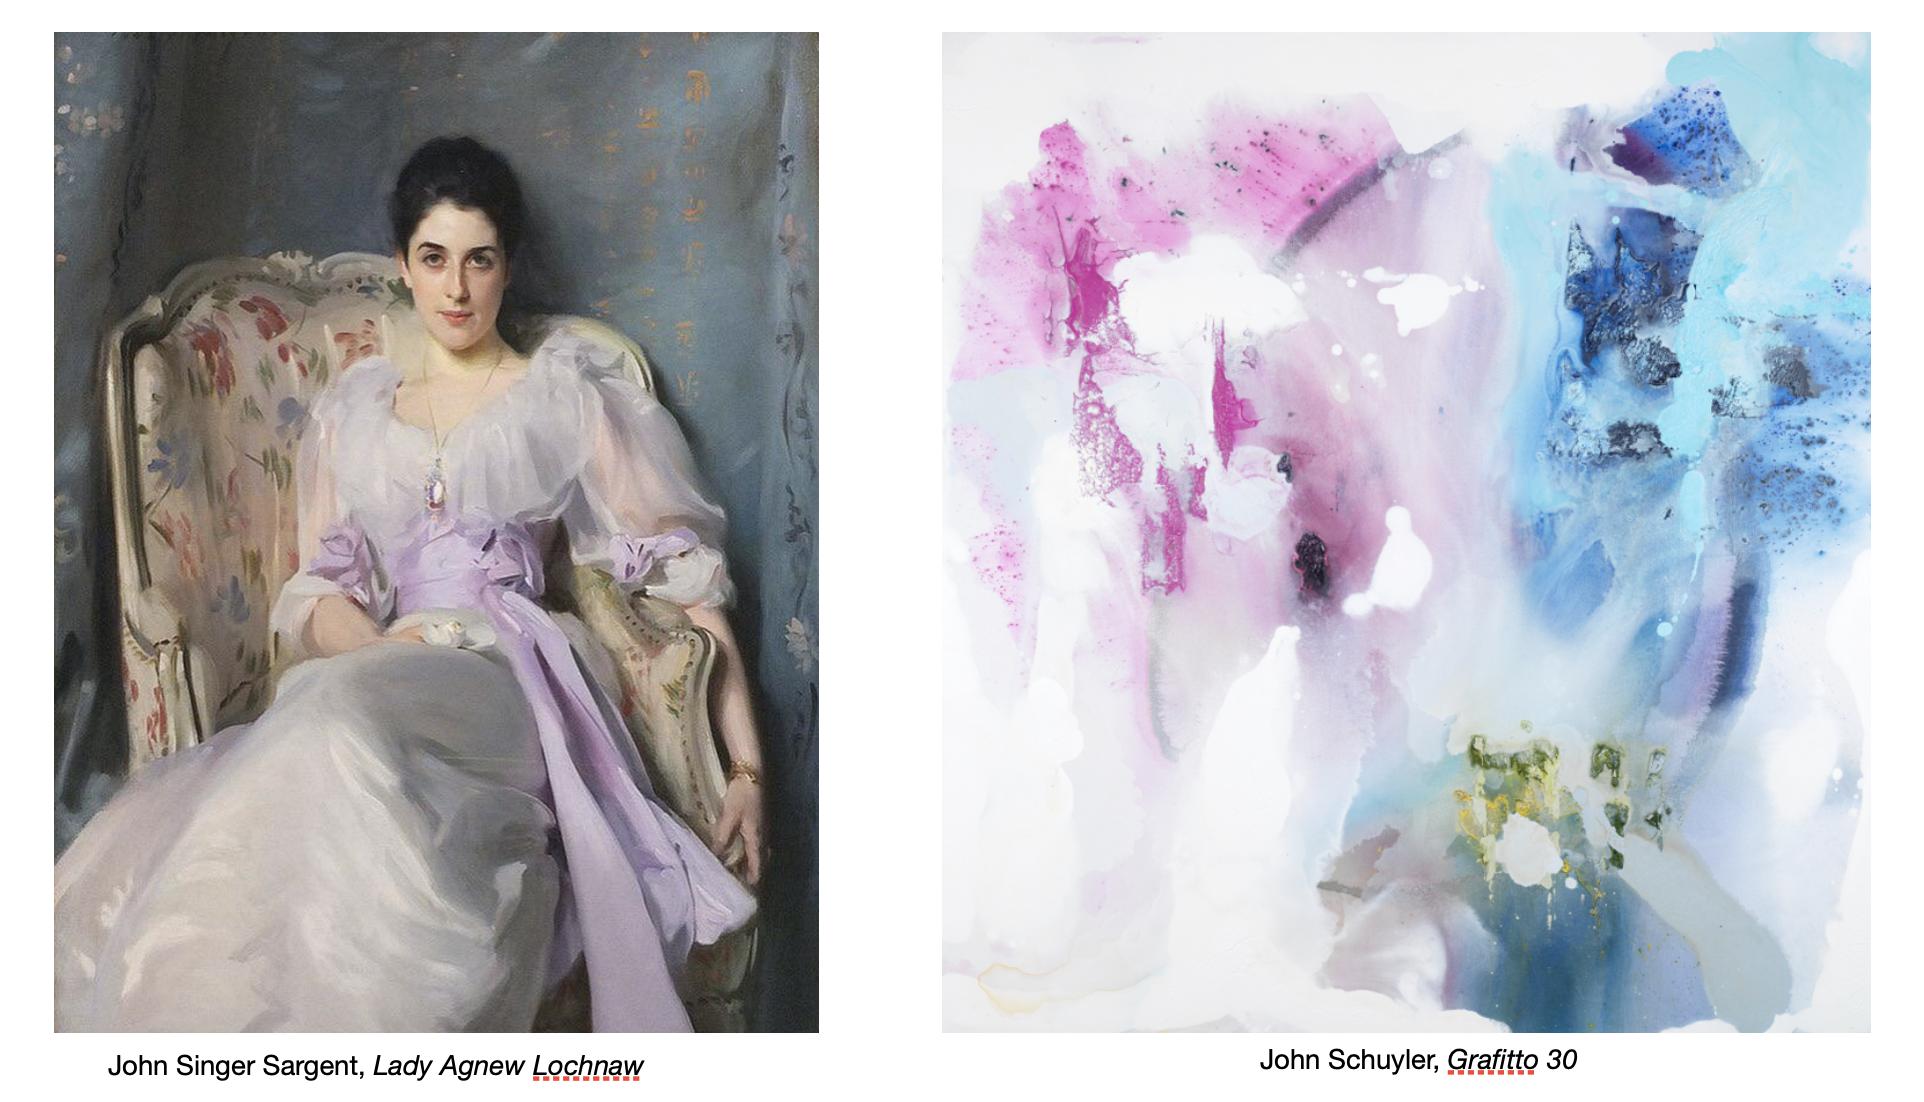 John Singer Sargent portrait, John Schuyler abstract painting